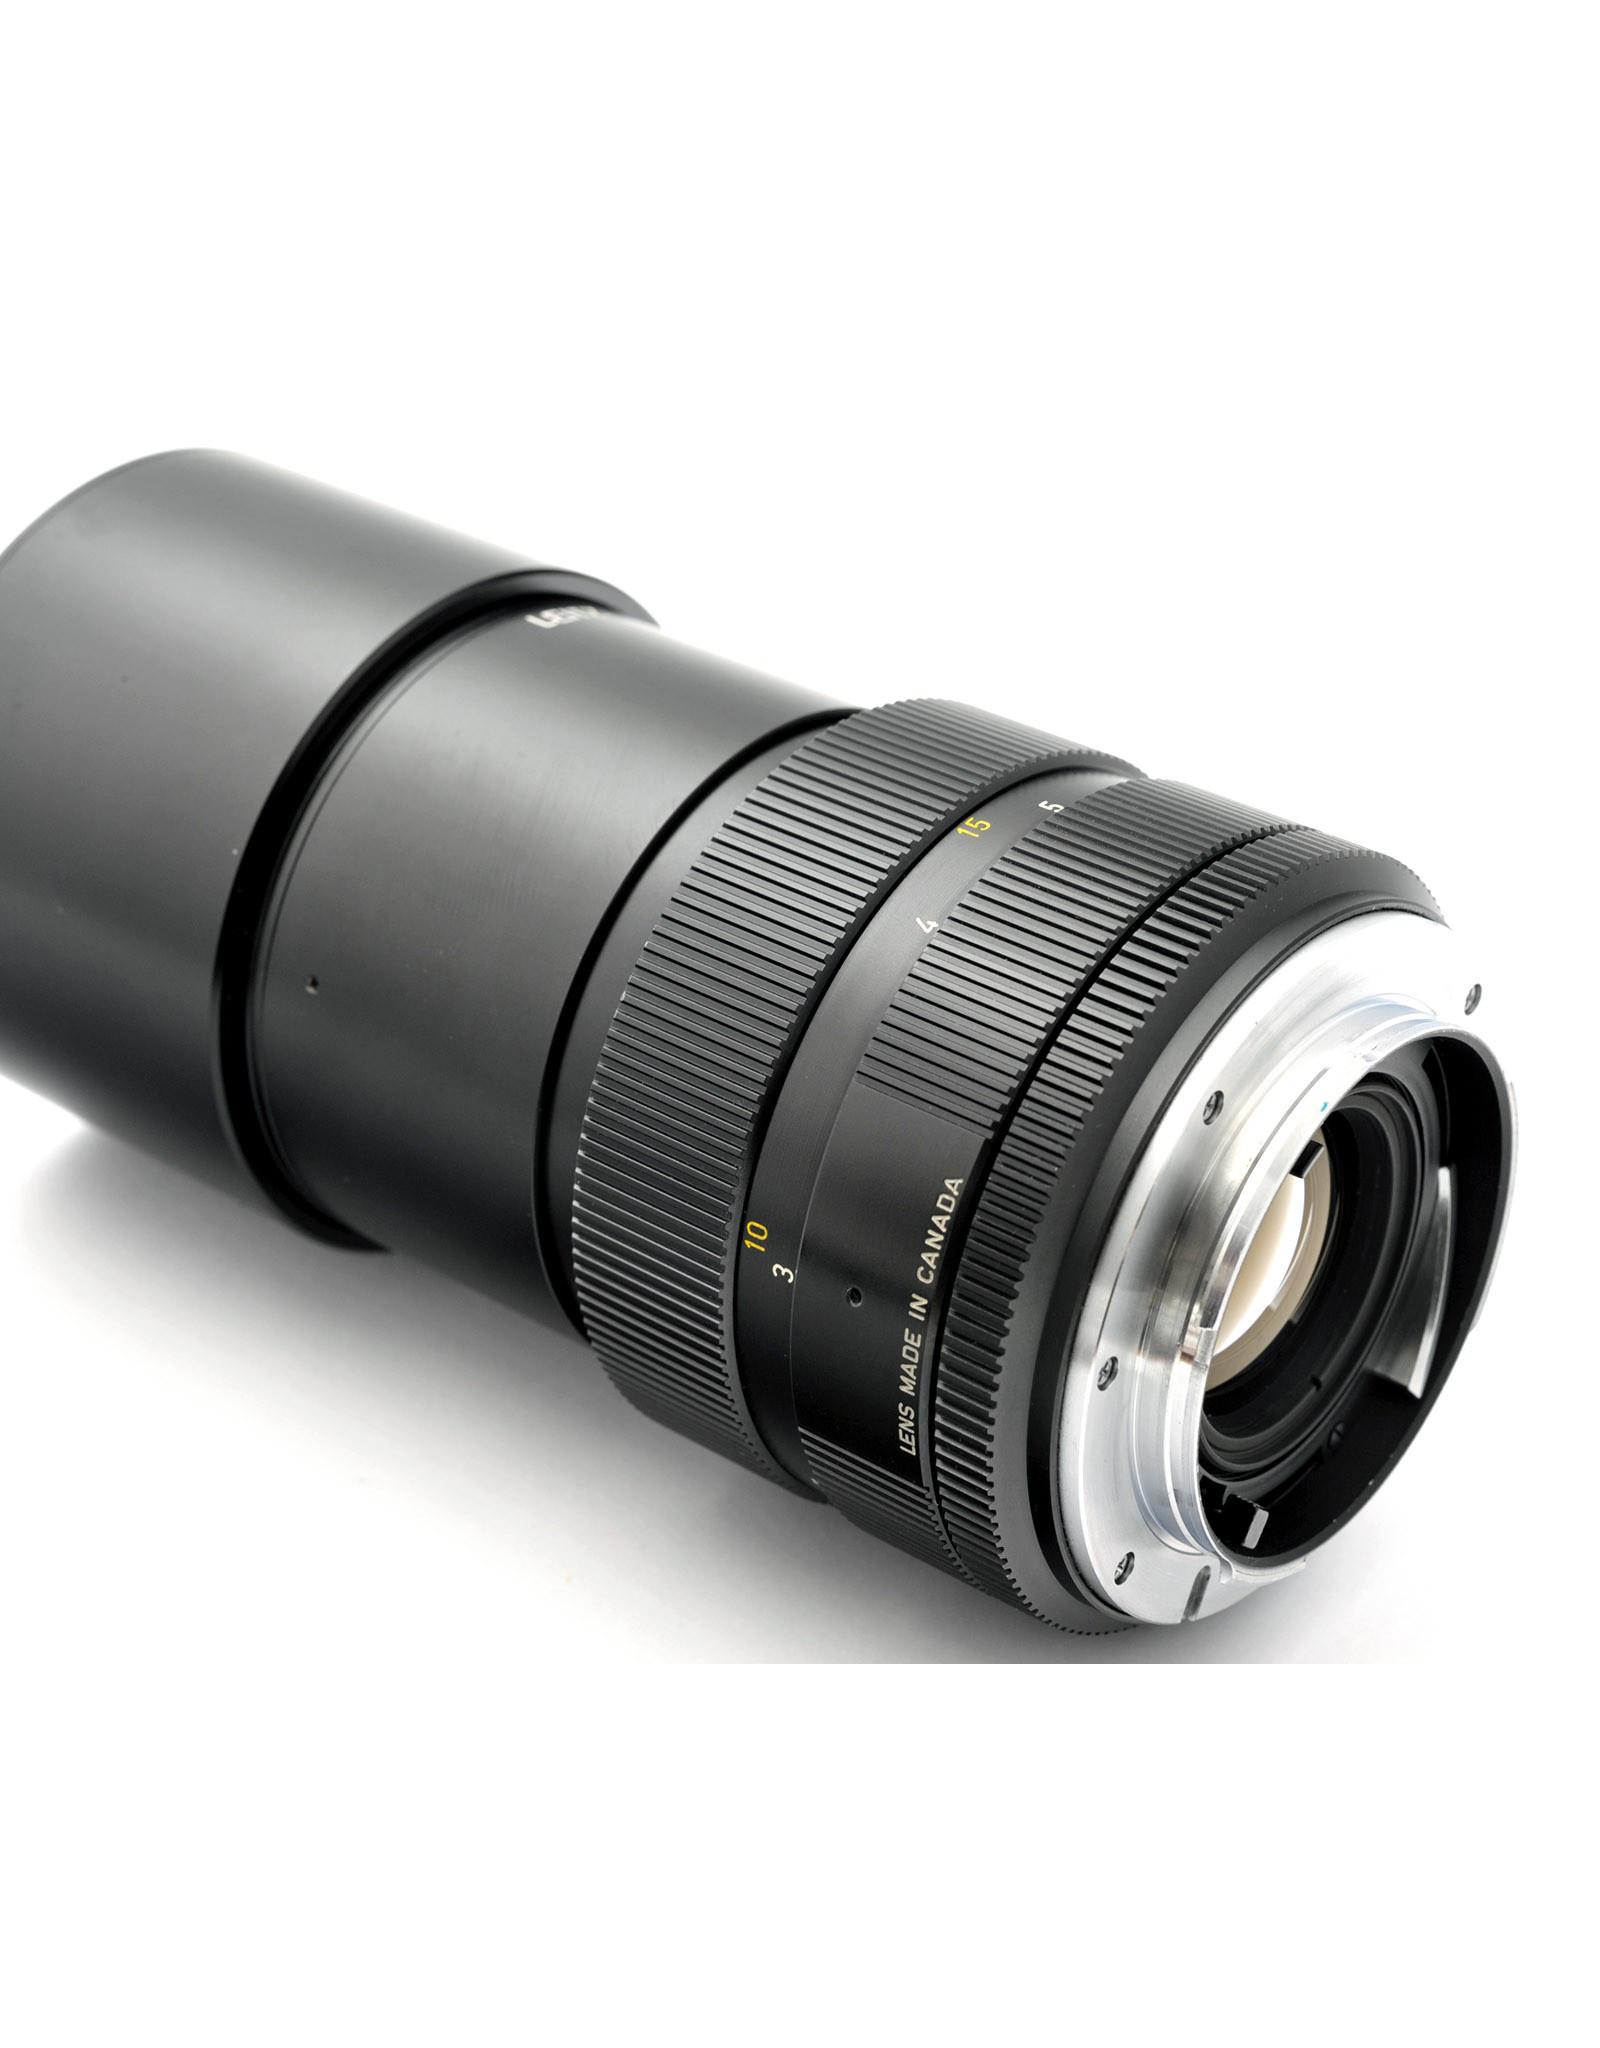 Leica Leica 180mm f3.4 APO-Telyt-R 3 Cam   ALC121504